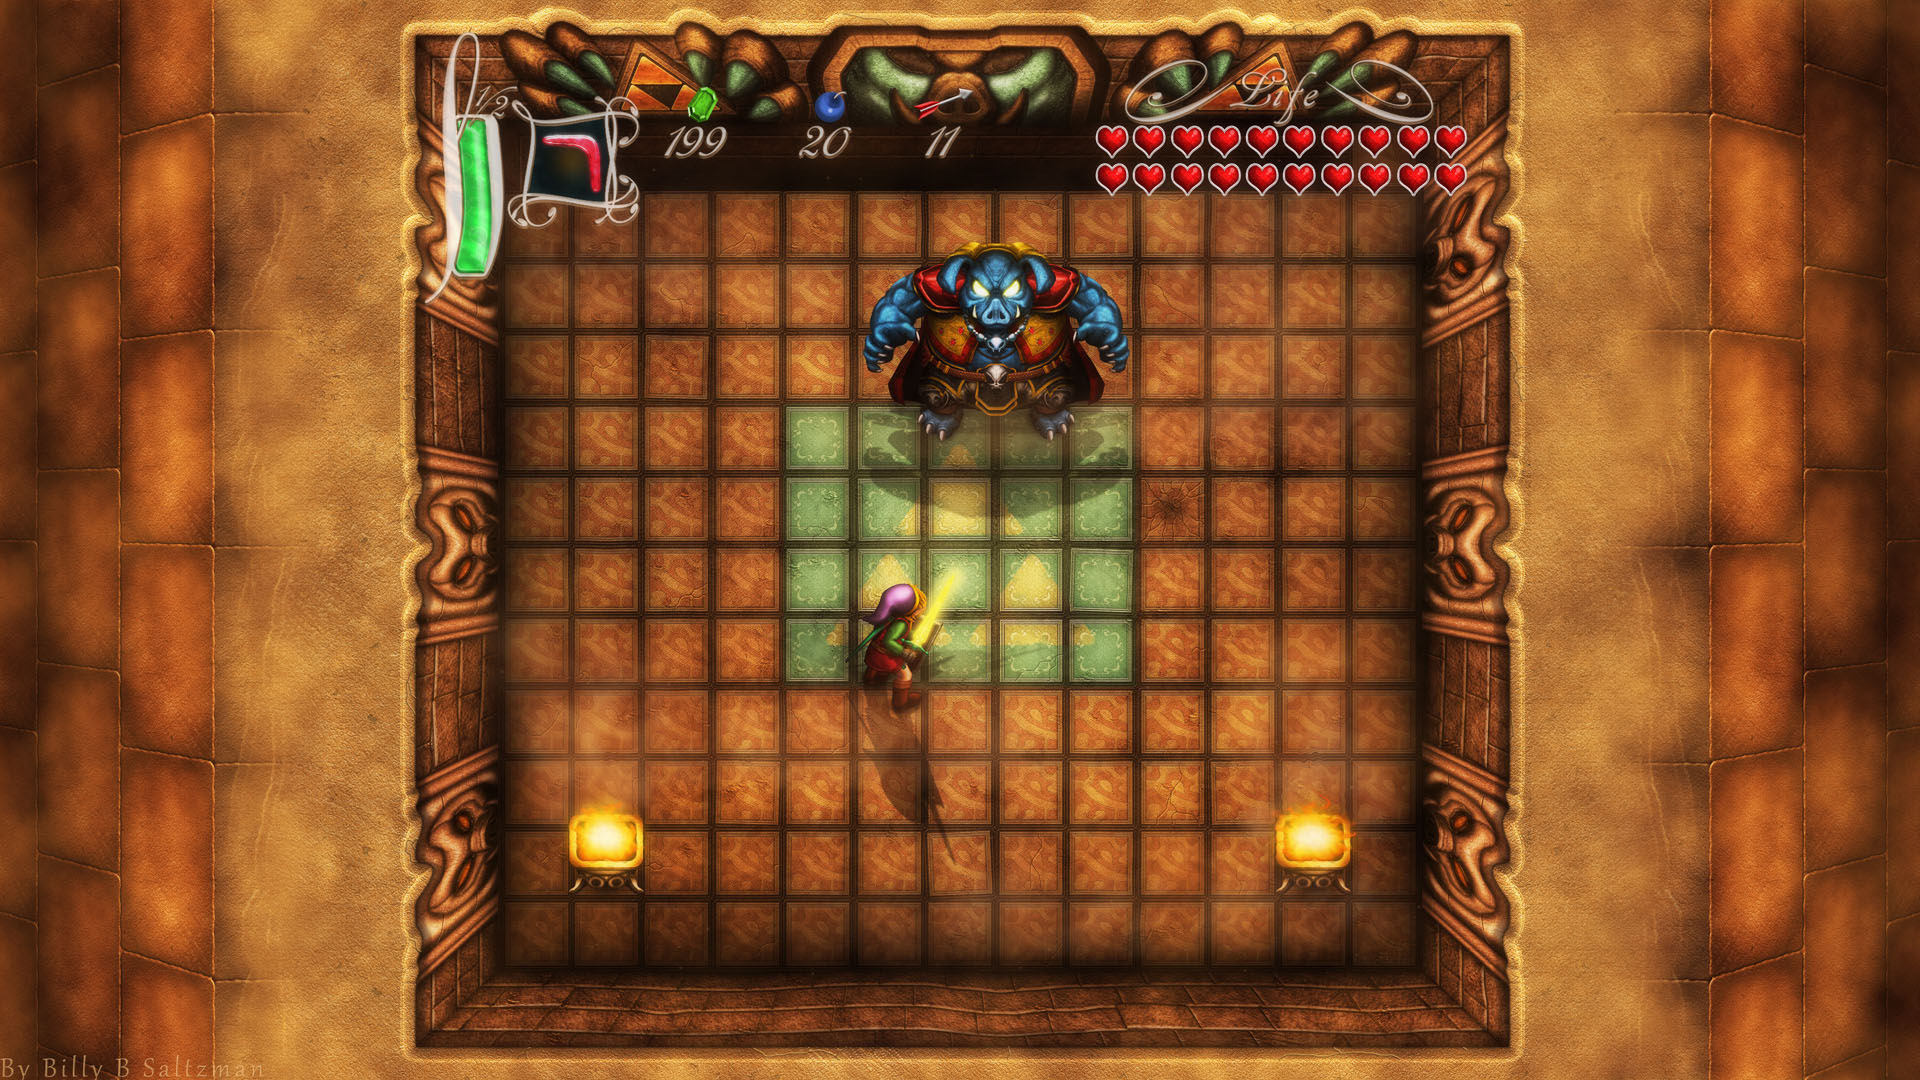 A Link To The Past The Legend Of Zelda Wallpaper 39723363 Fanpop